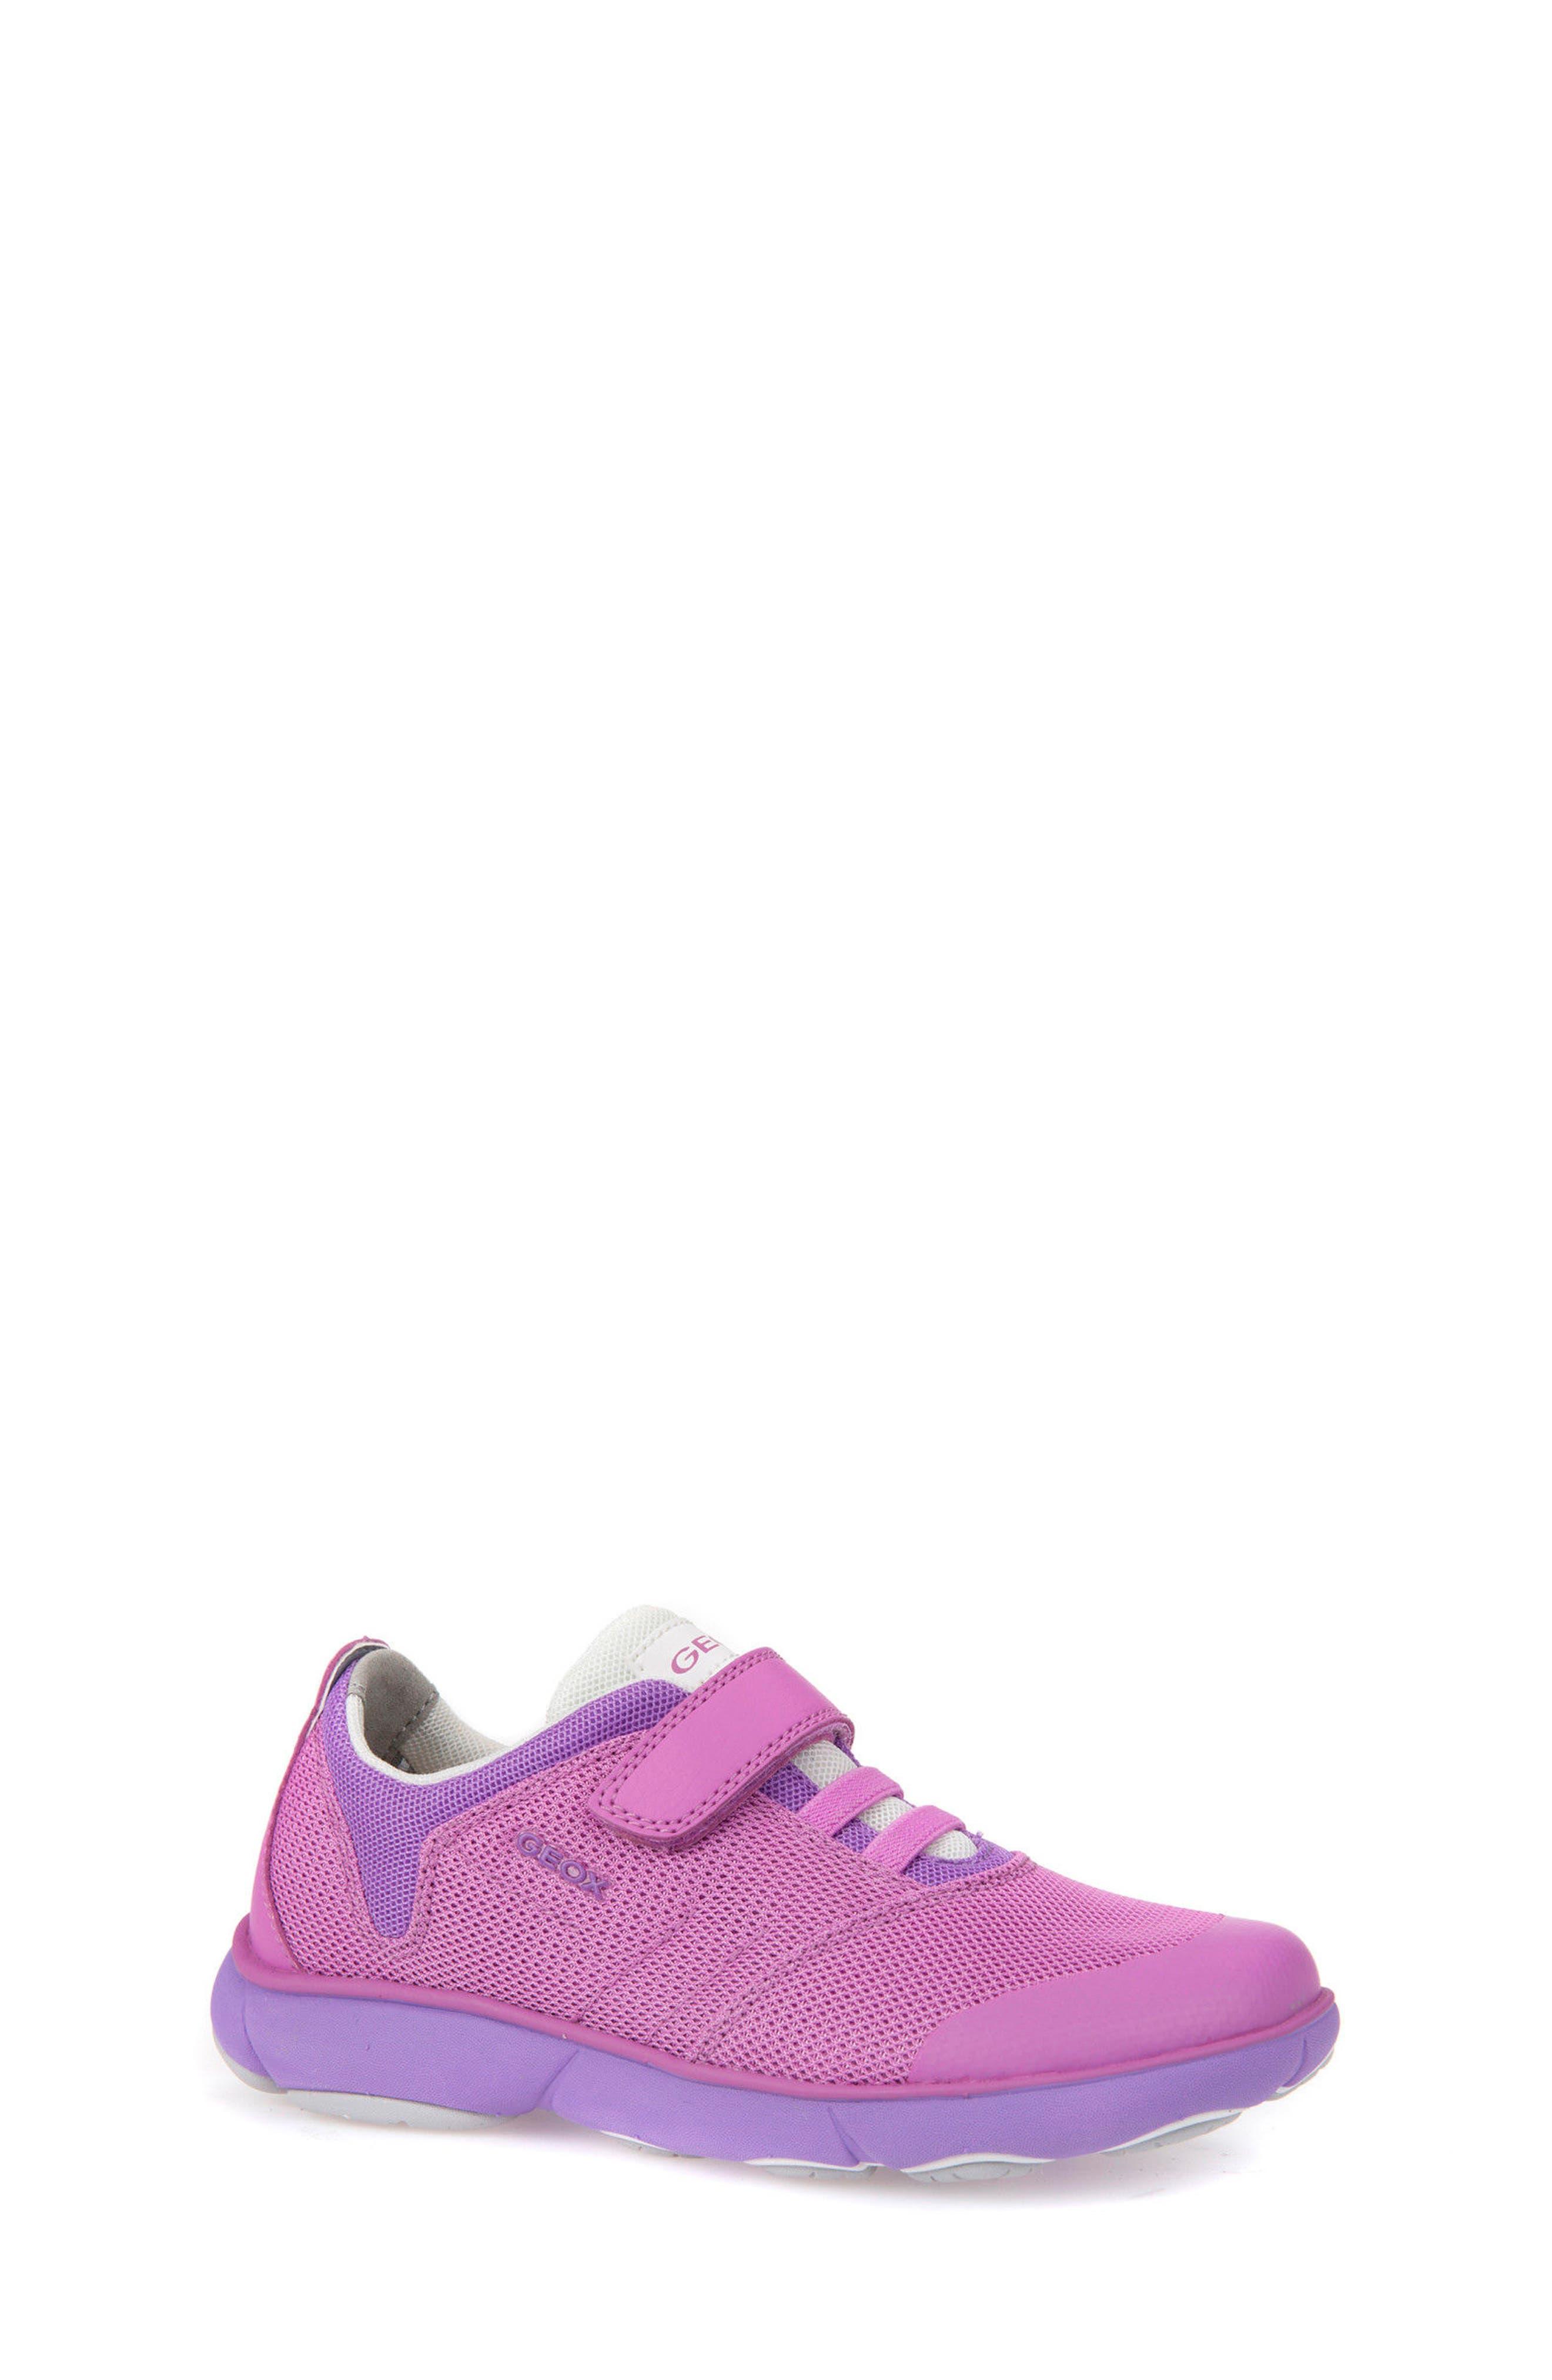 Jr Nebula Waterproof Sneaker,                             Main thumbnail 1, color,                             FUCHSIA